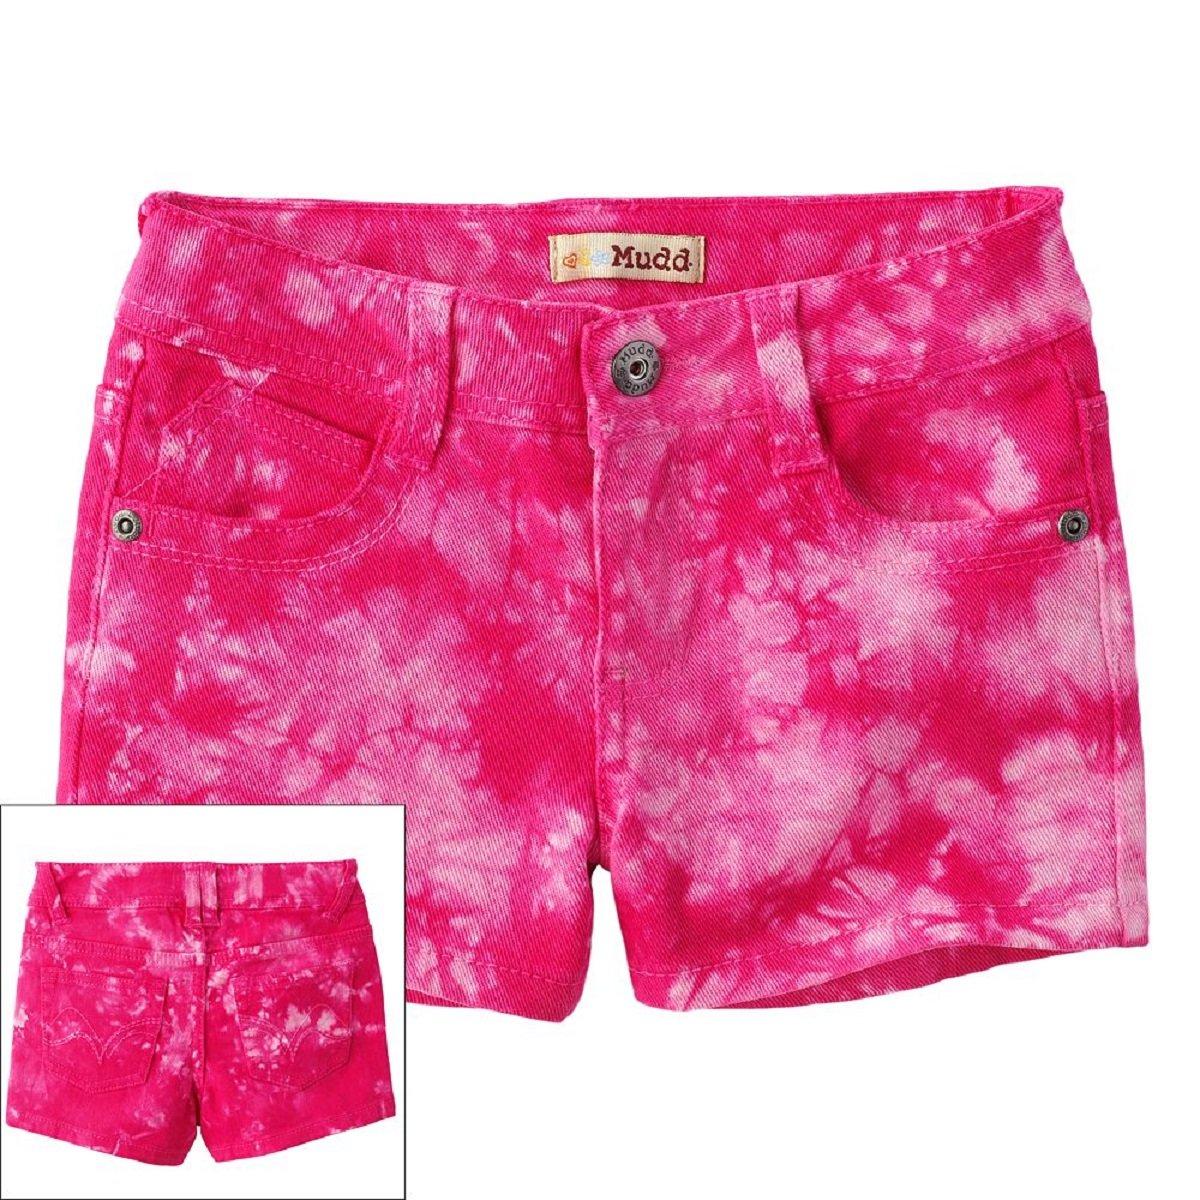 Mudd Little Girls Tie Dye Denim Shorts